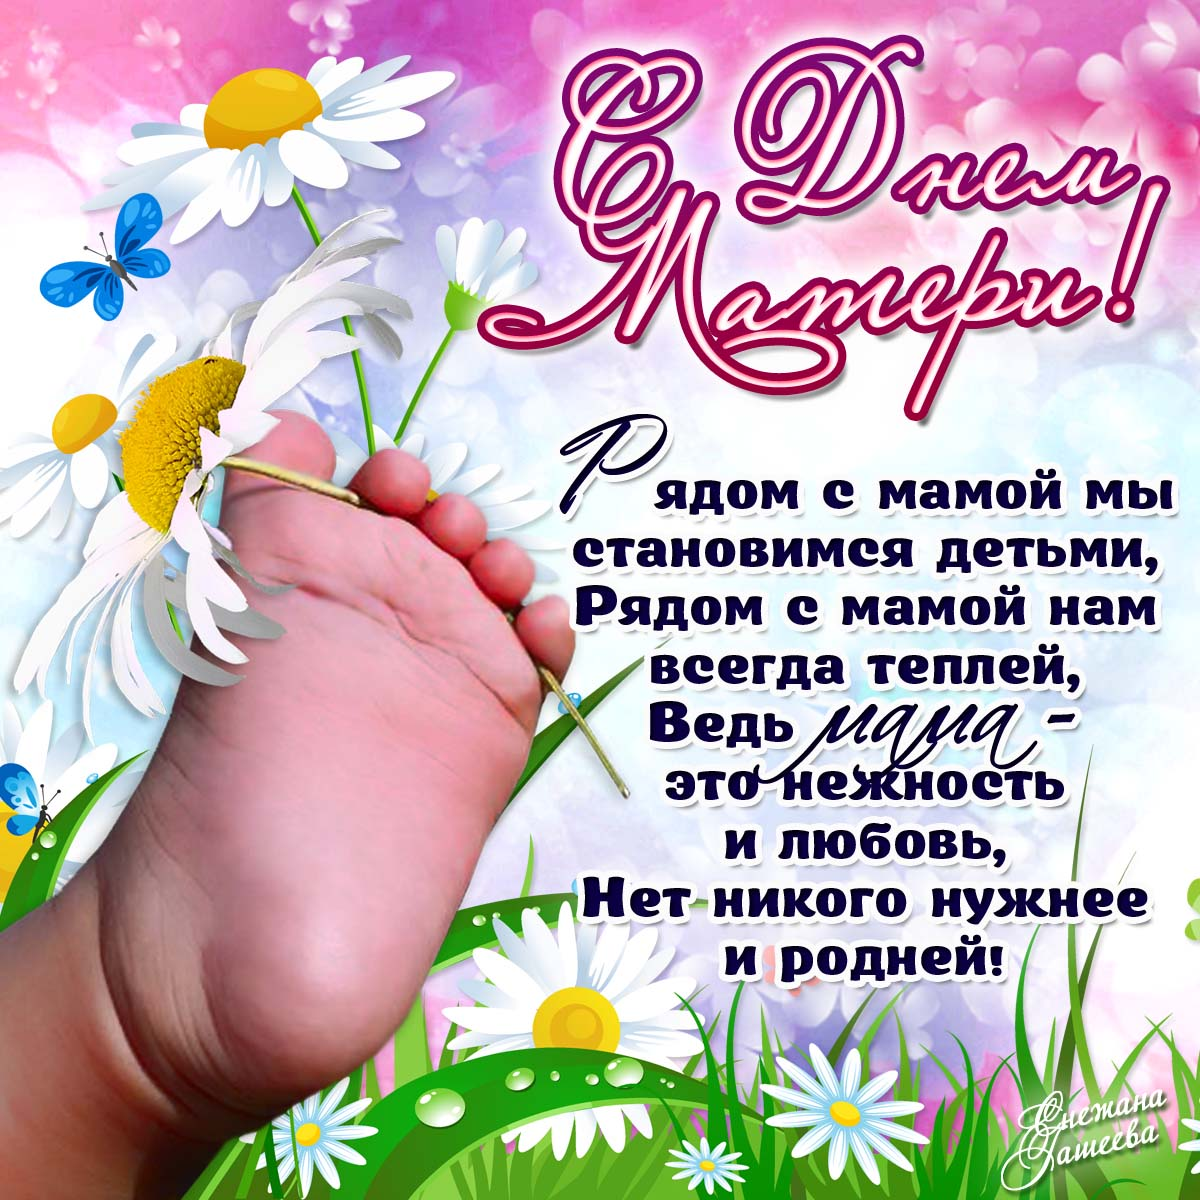 Айкидо хорошем, картинки открытка к дню матери